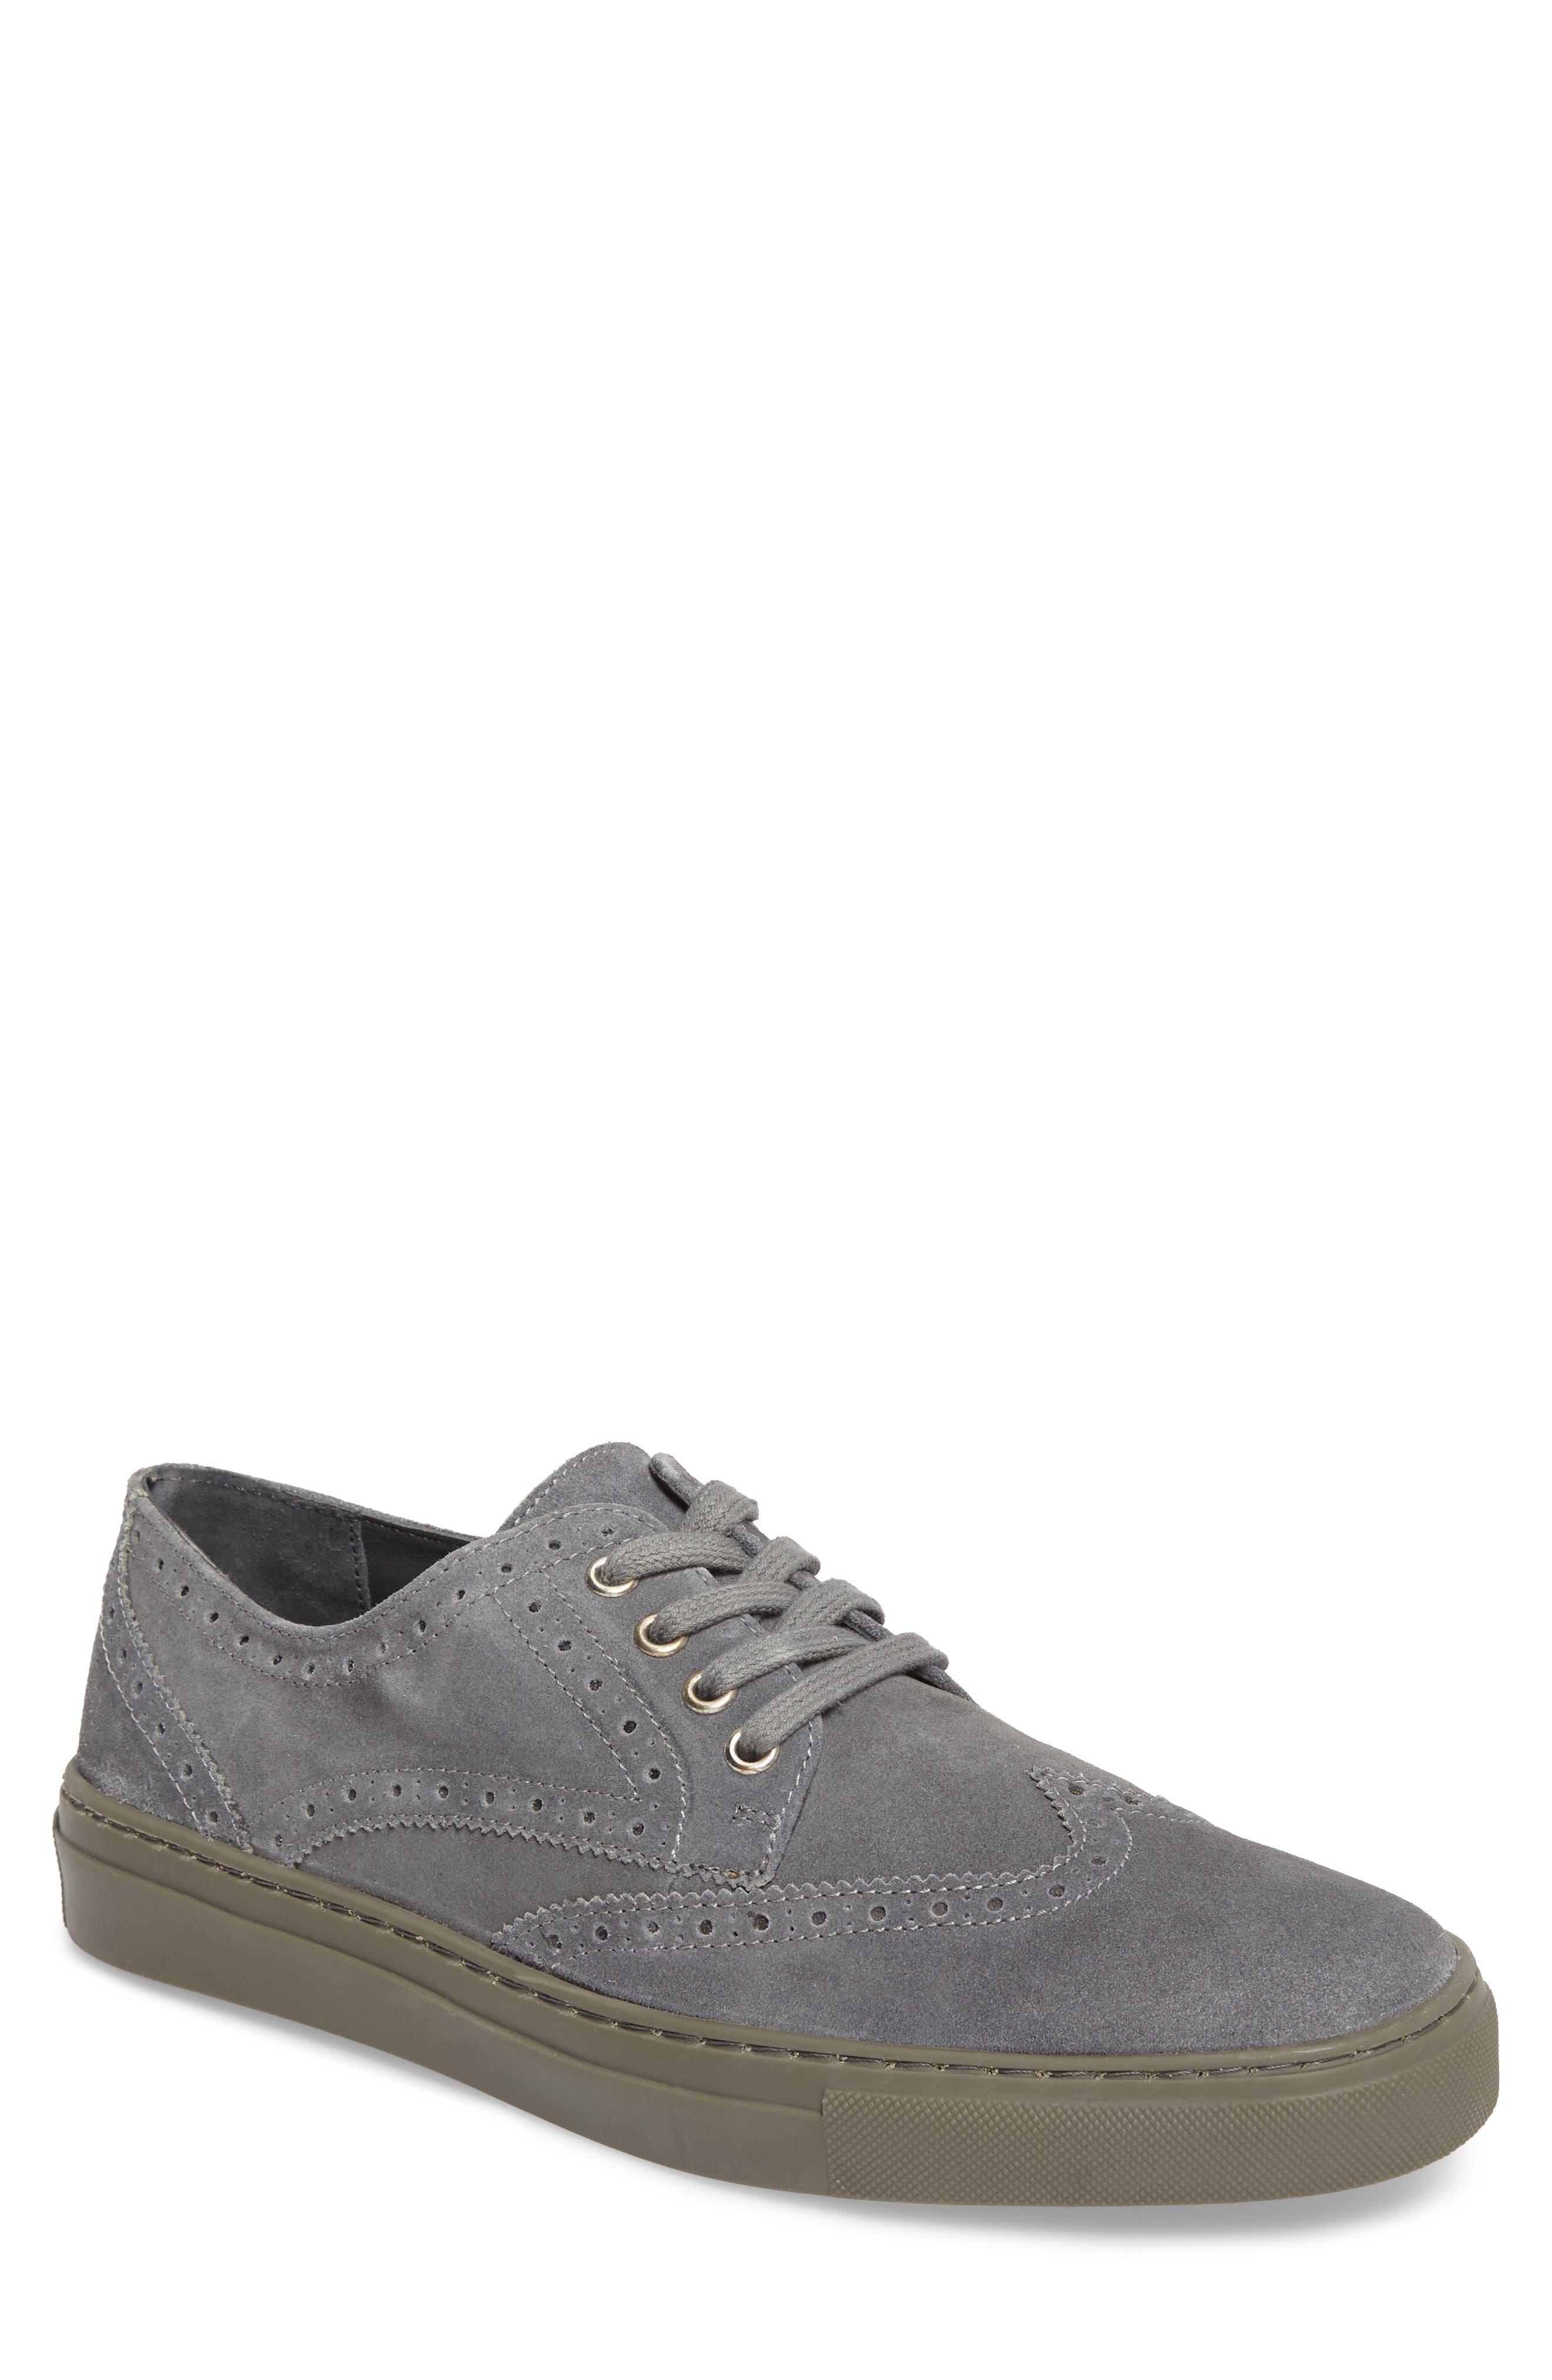 J SHOES Warner Sneaker (Men)